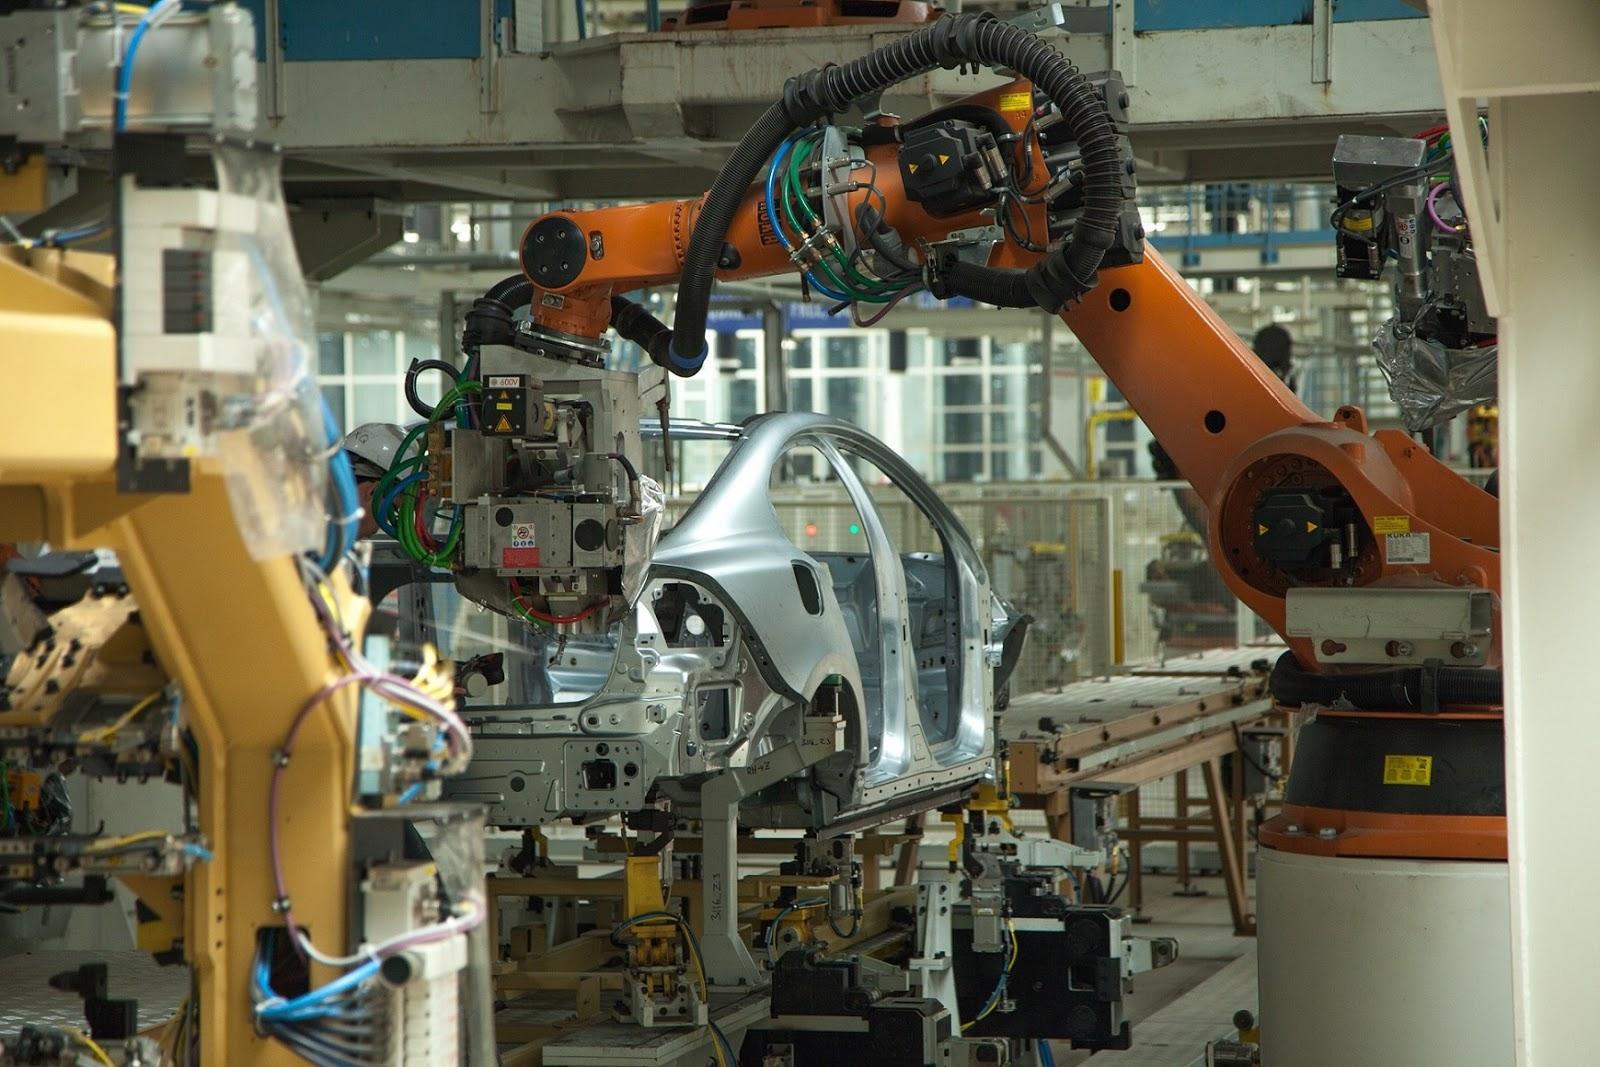 VOLVO NEW2BMANUFACTURING2BSTRATEGY2B4 H Volvo αυξάνει την παραγωγή της και αλλάζει στρατηγική για τα εργοστάσιά της σε Ευρώπη, Κίνα, ΗΠΑ Volvo, Volvo Cars, Volvo S90, Volvo S90 Excellence, αγορά, Τεχνολογία